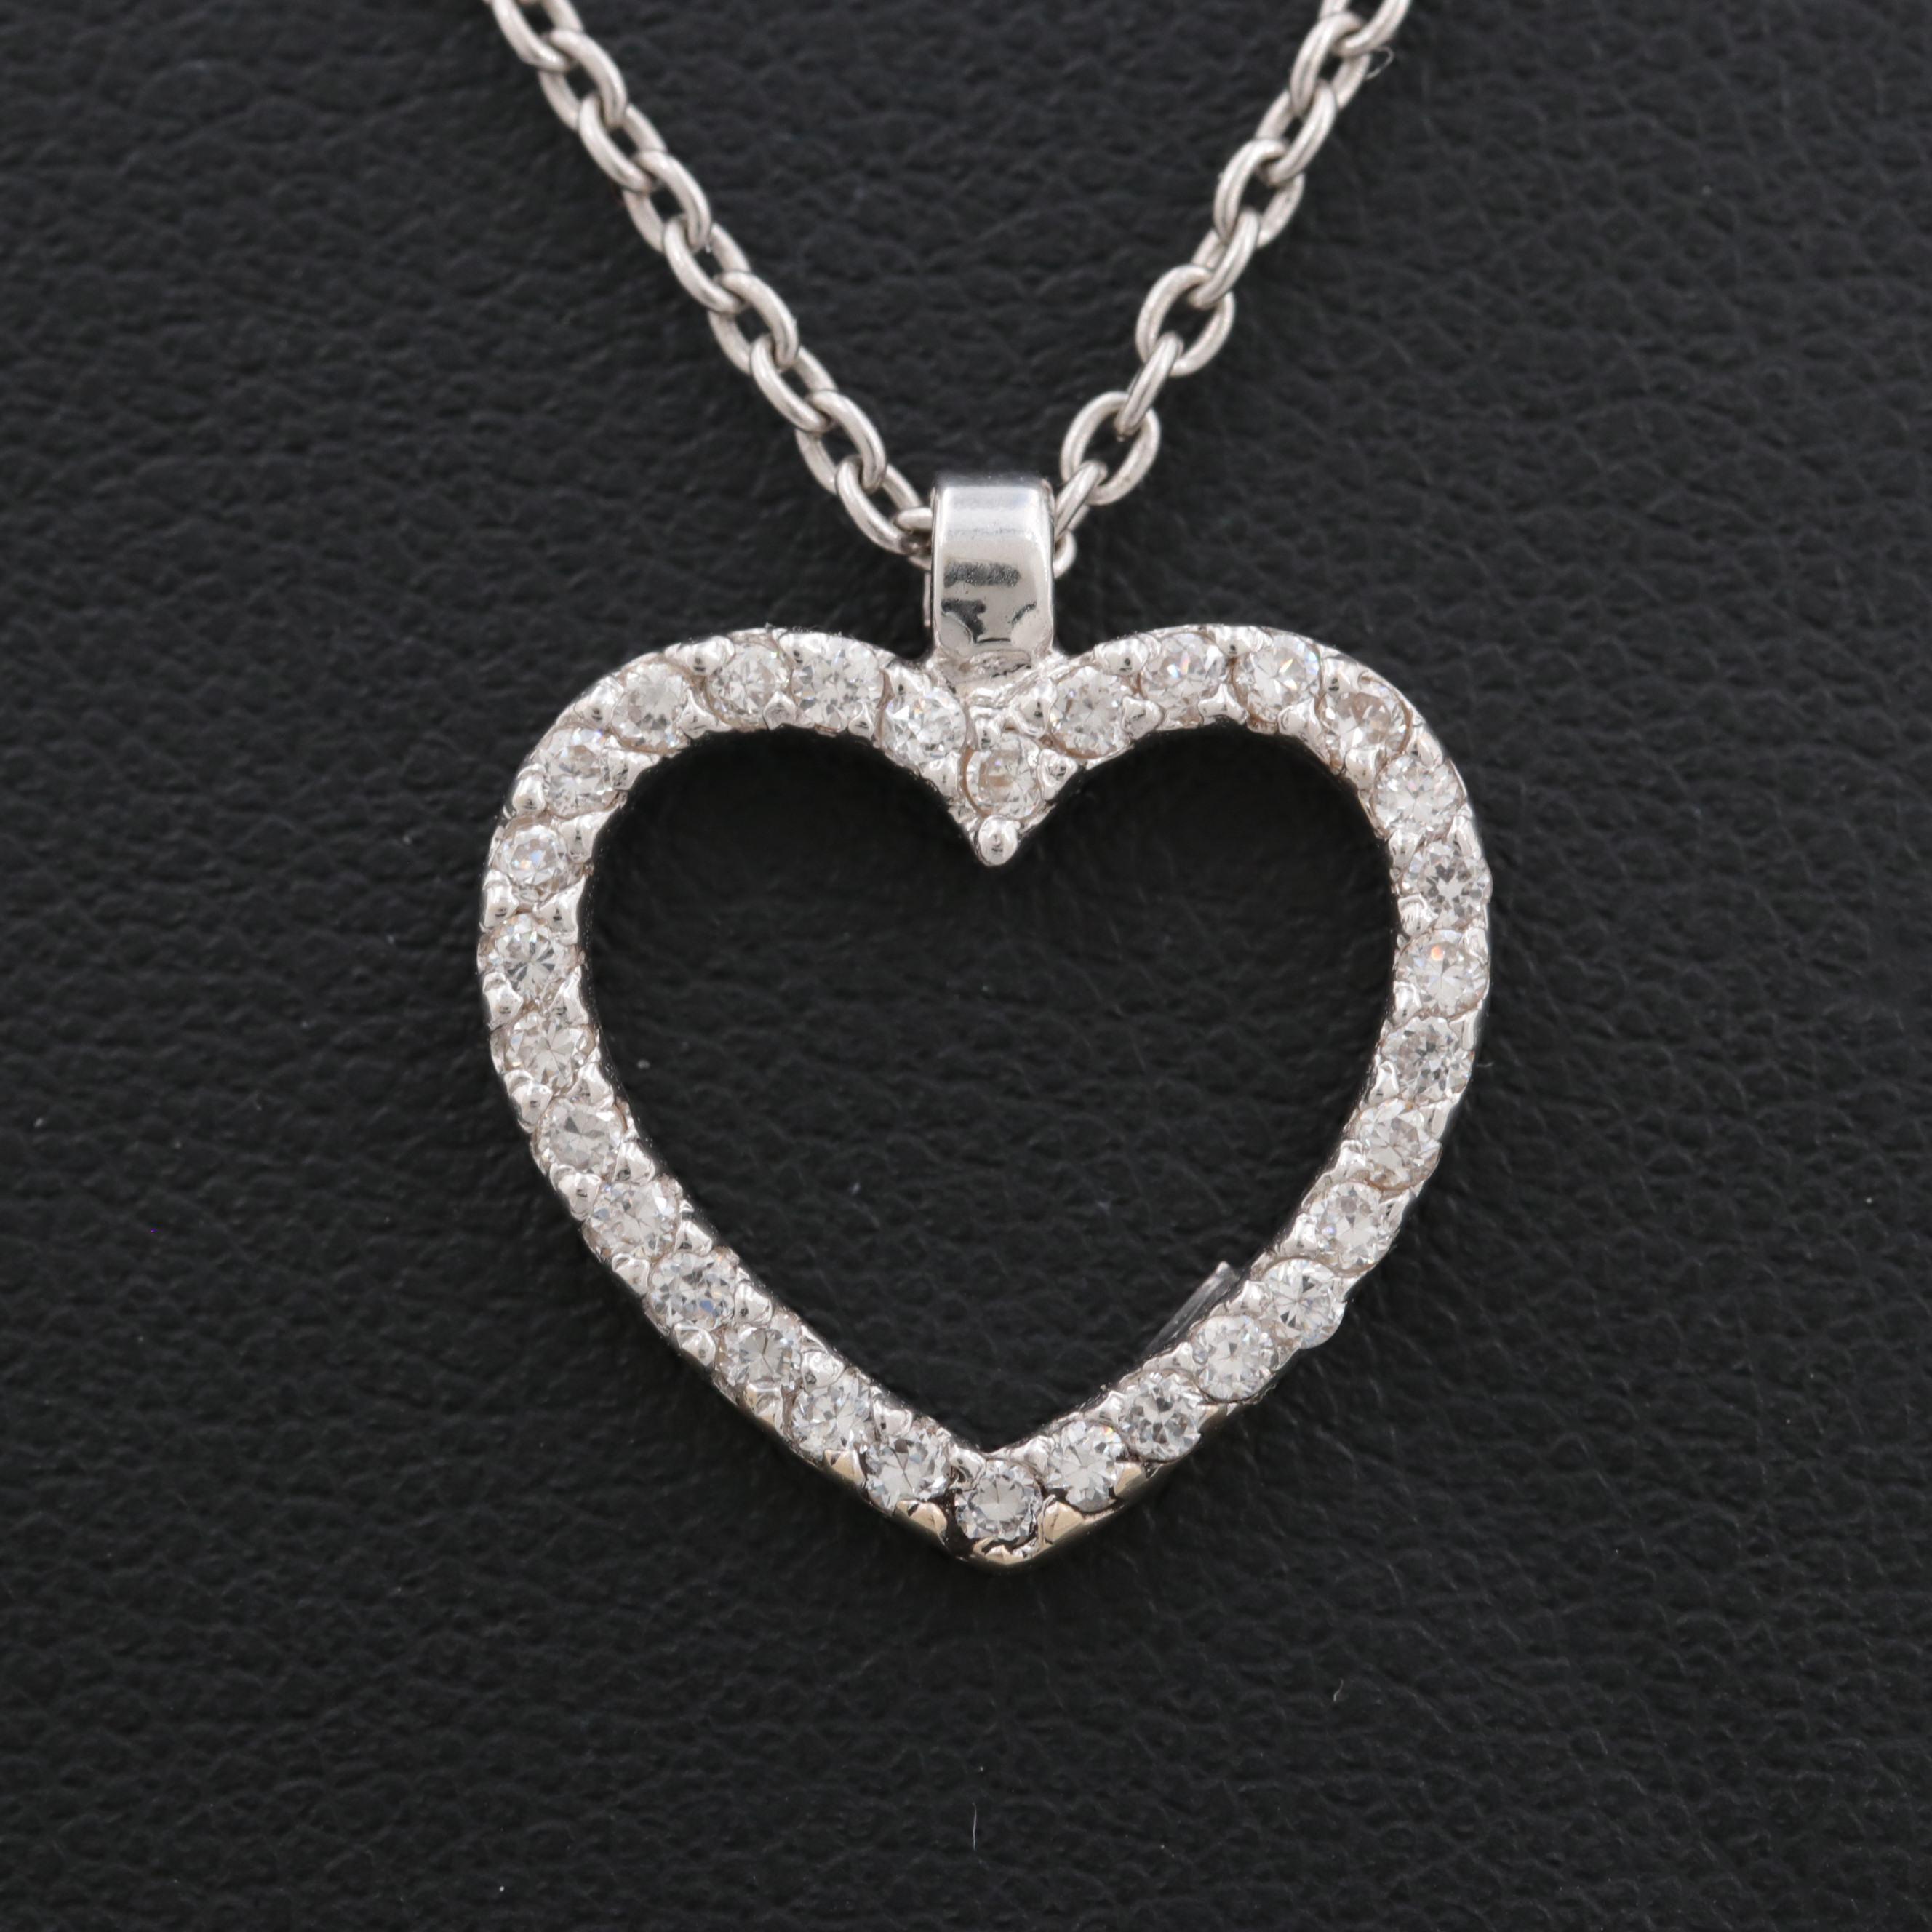 18K White Gold Cubic Zirconia Heart Pendant Necklace